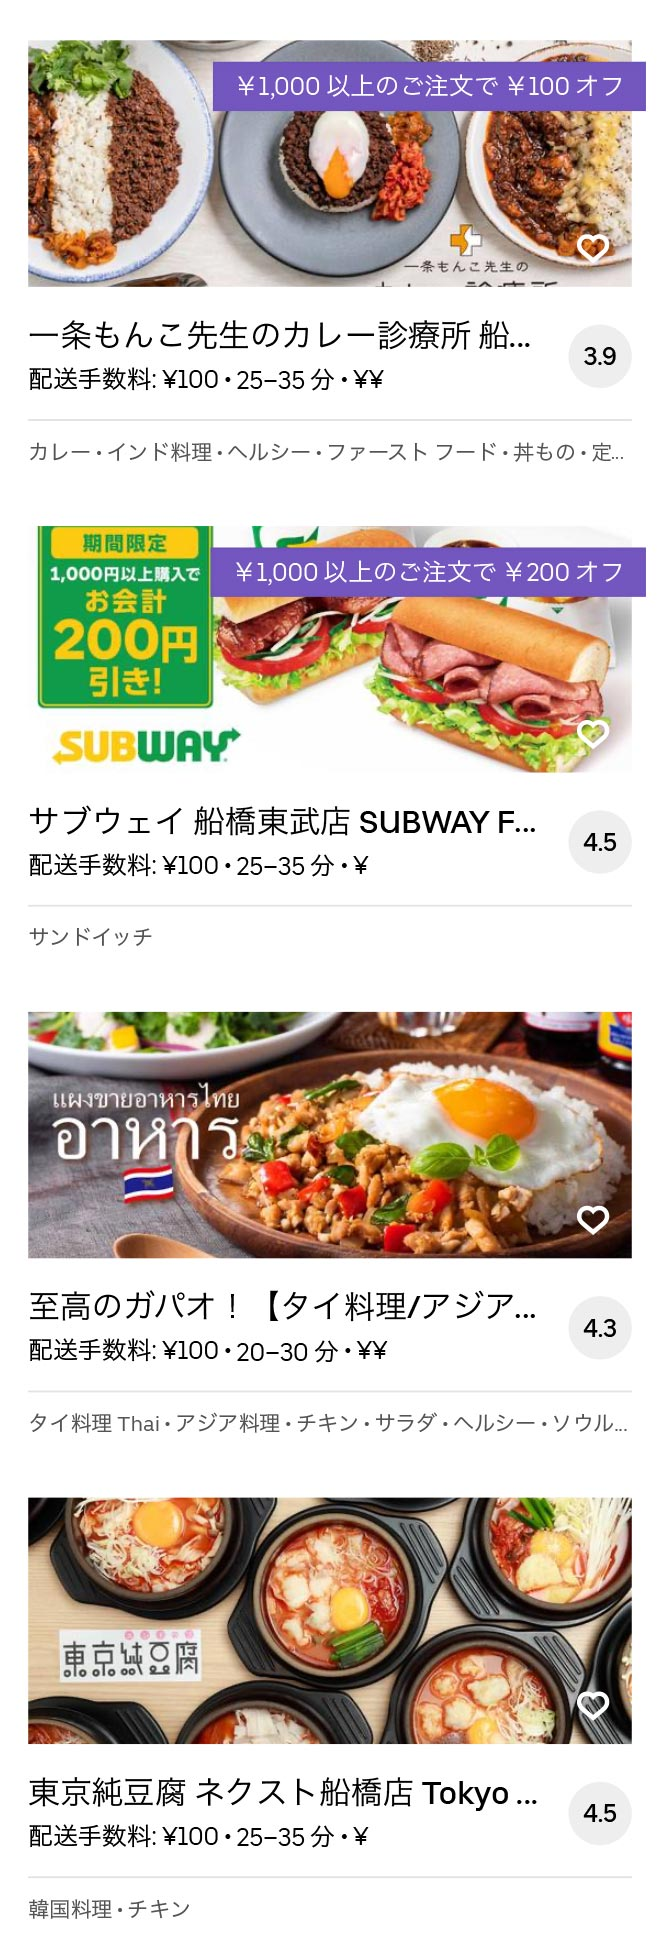 Funabashi menu 2008 03